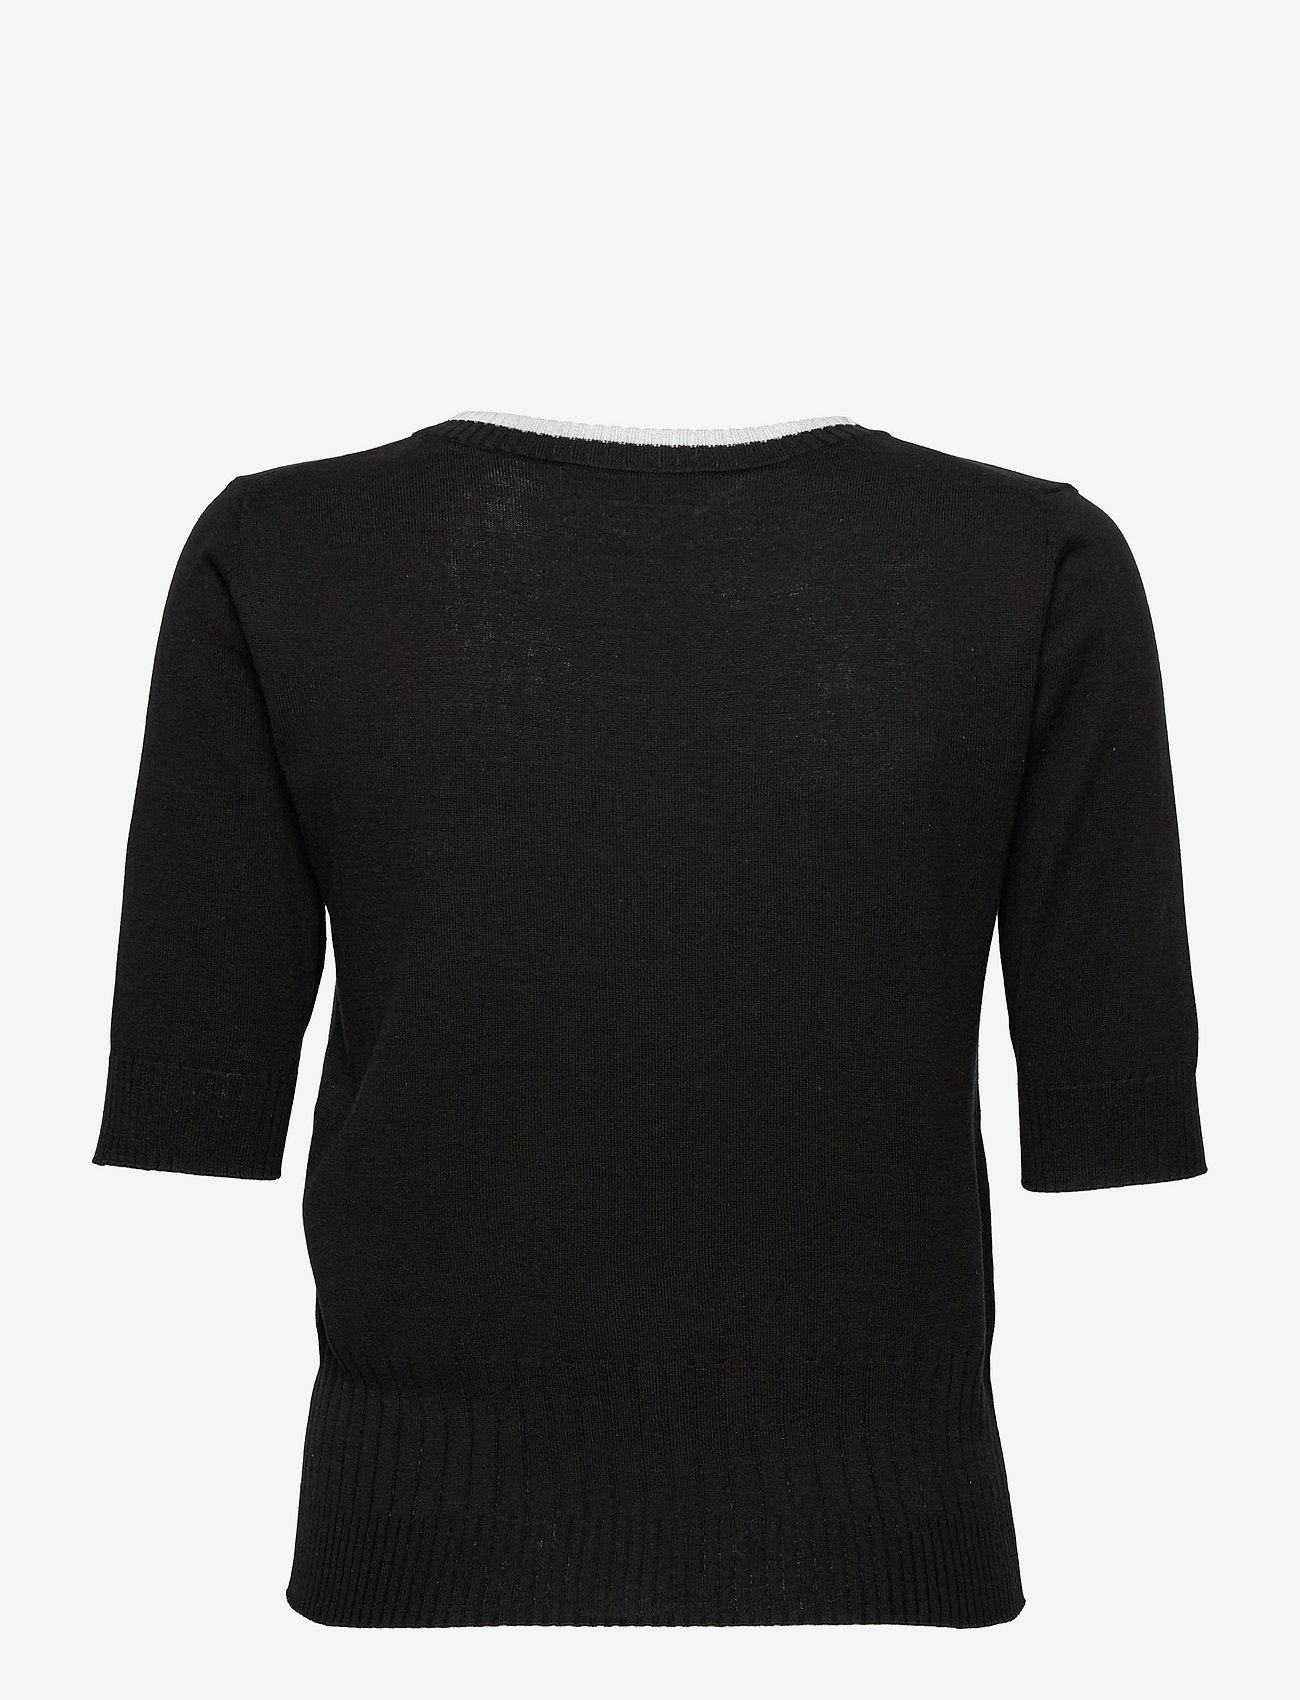 Max&Co. - SAGGIO - gebreide t-shirts - black - 1